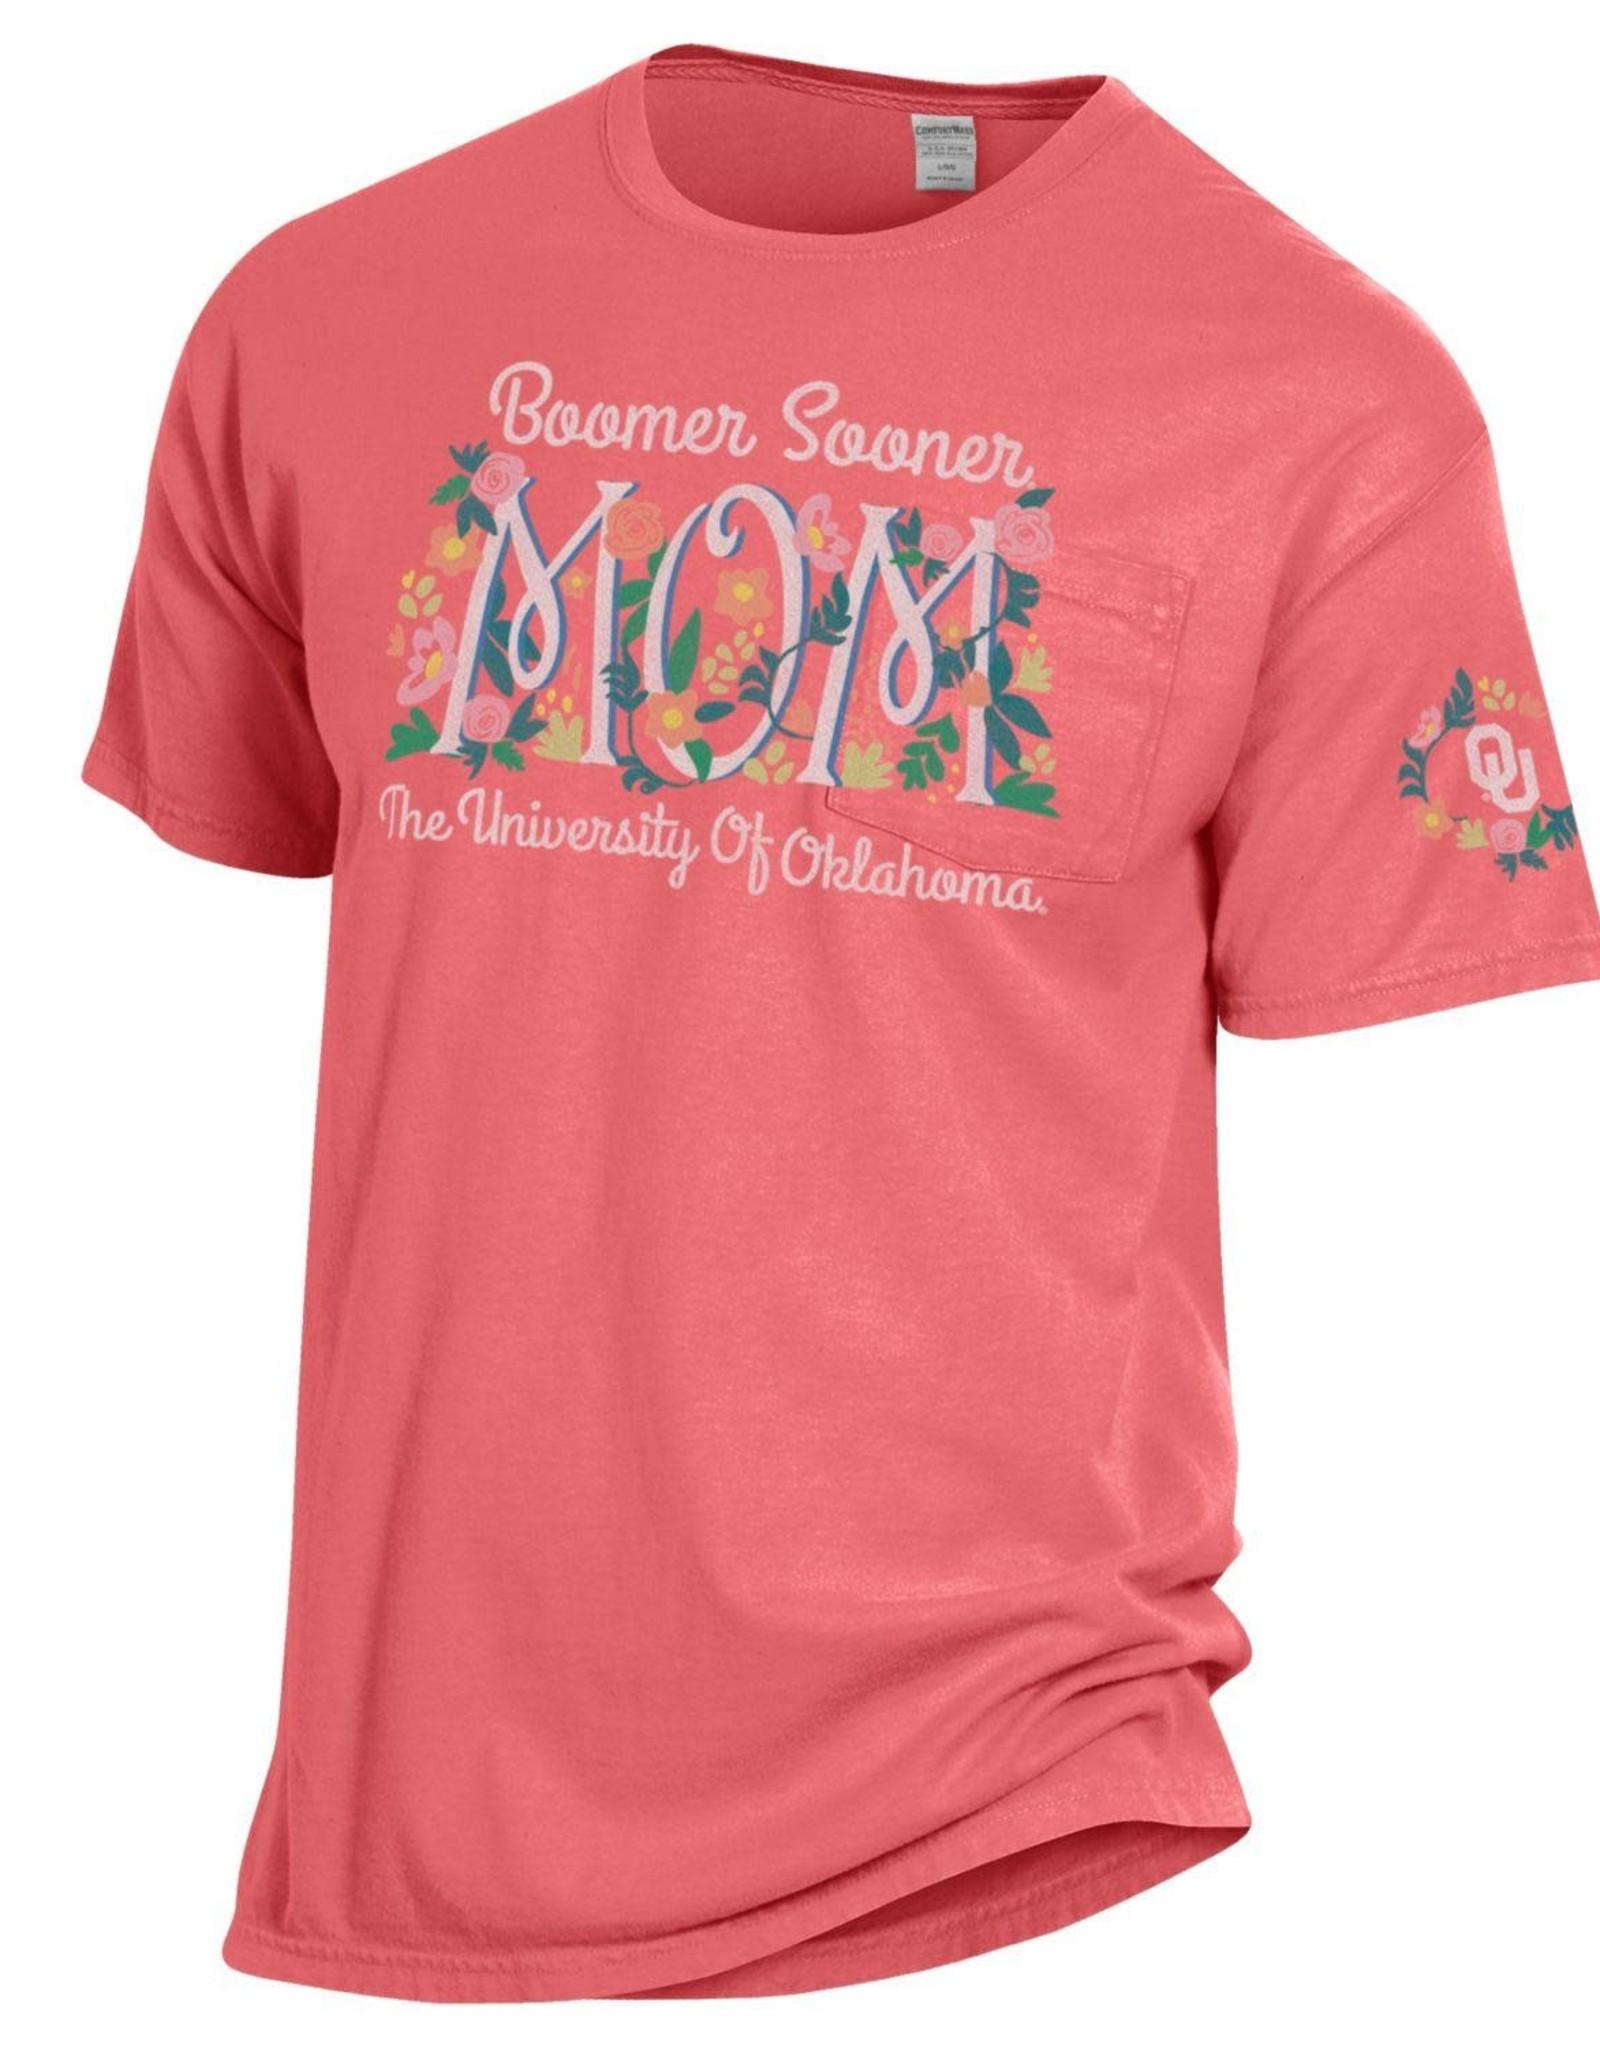 Hanes Comfort Wash The University of Oklahoma Mom Floral Pocket Tee